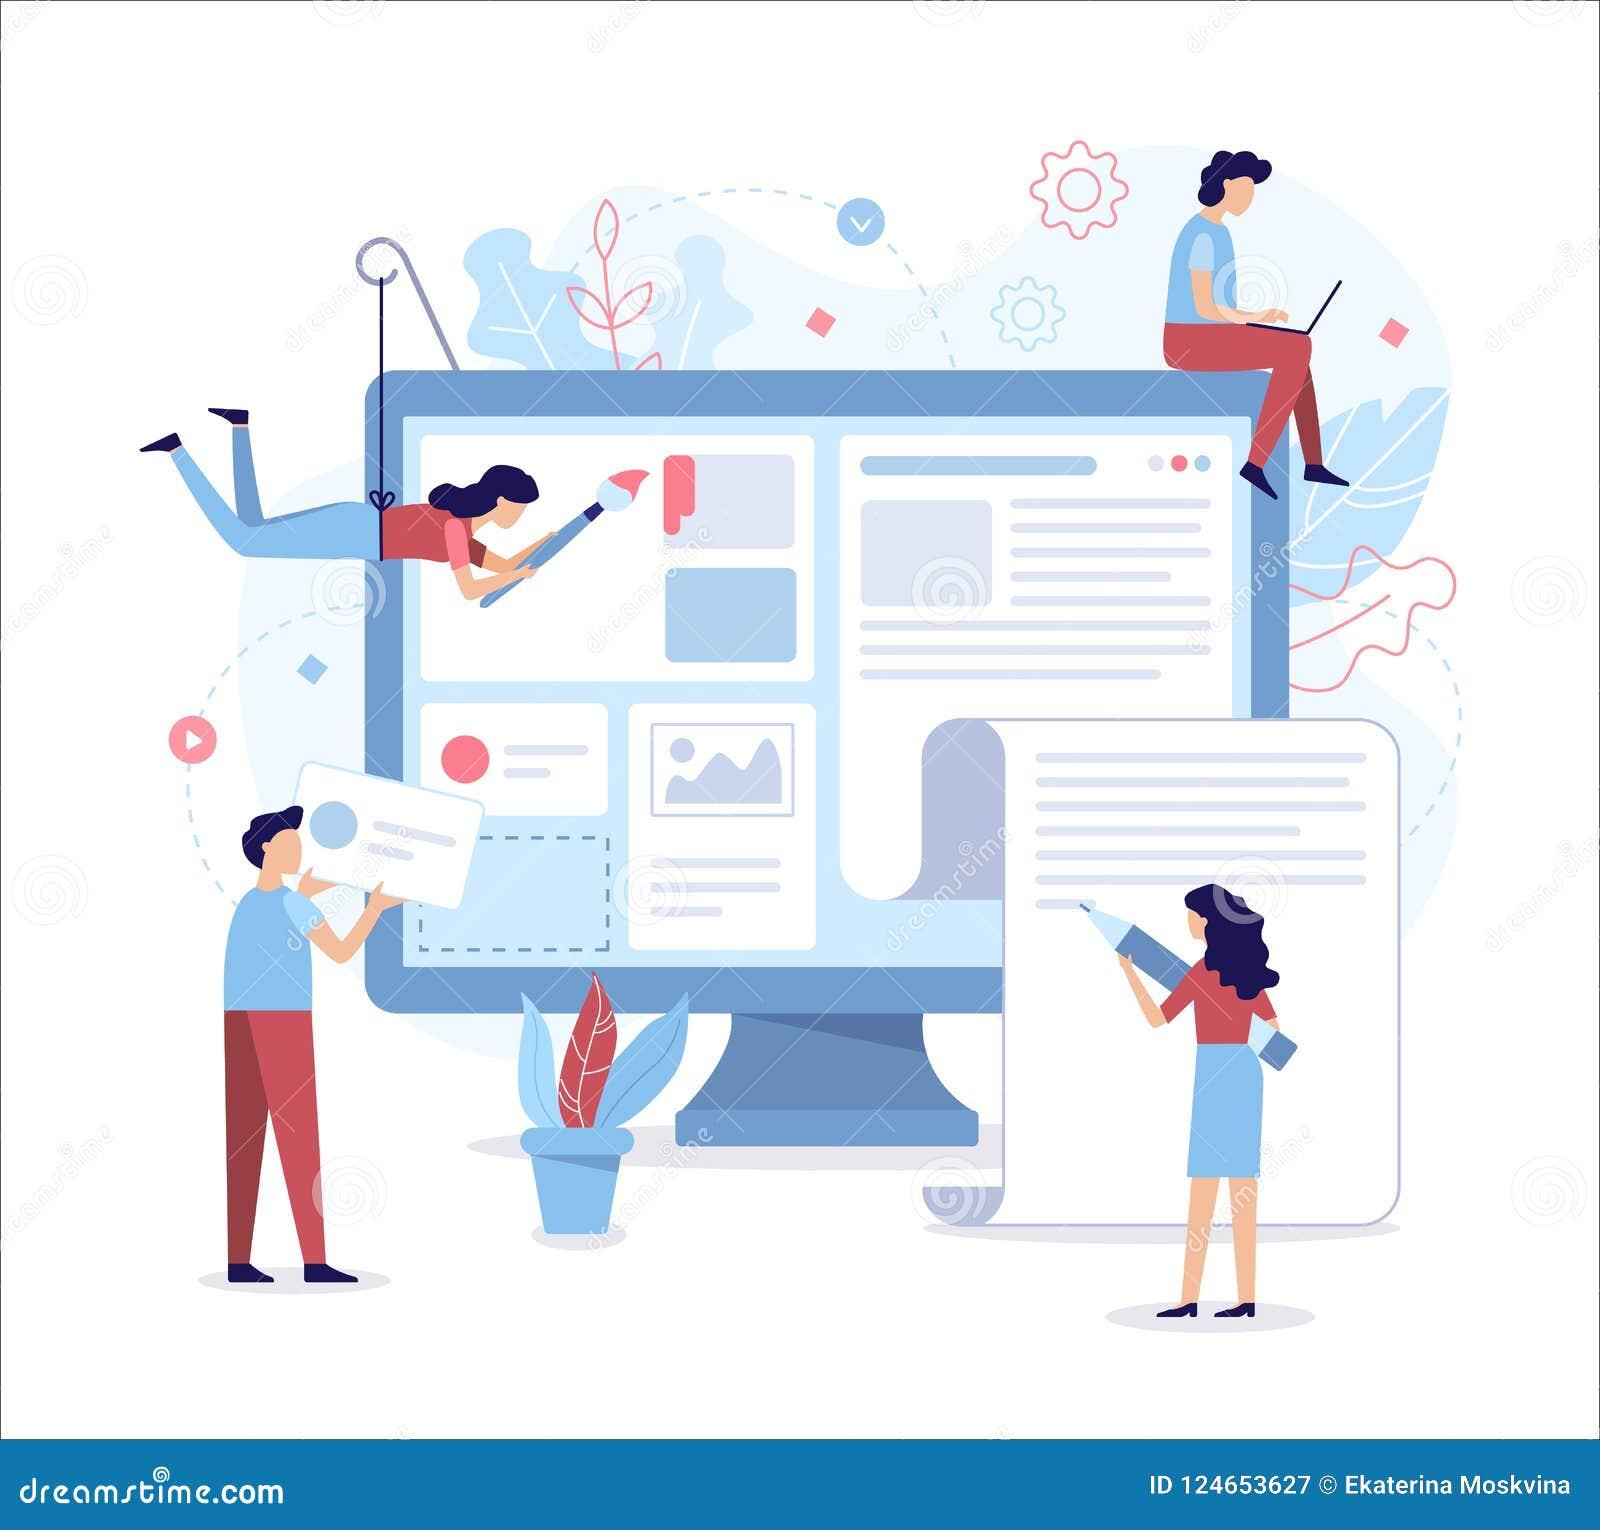 Web Development Flat Illustration Stock Vector Illustration Of Create News 124653627